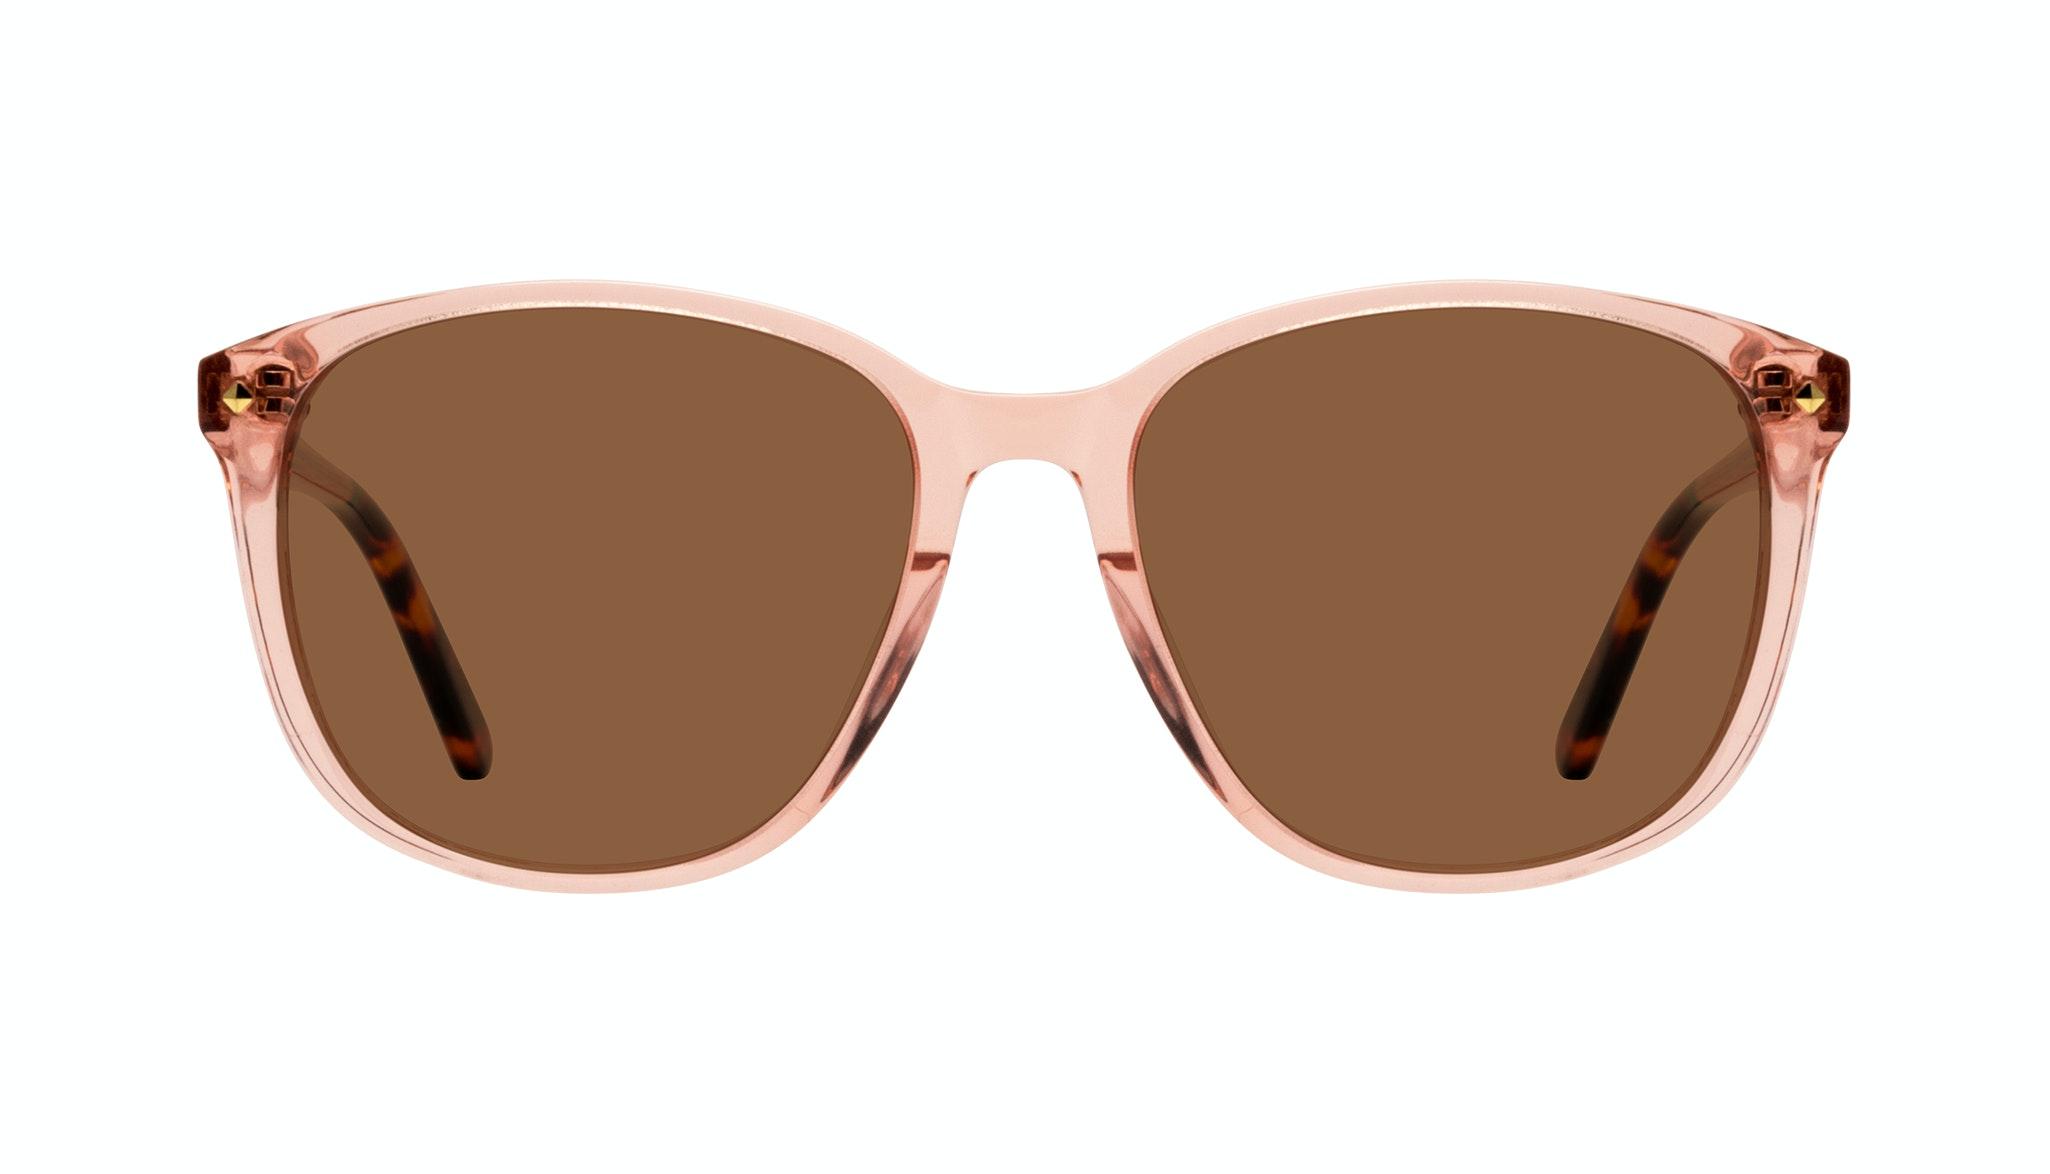 Affordable Fashion Glasses Square Sunglasses Women Lauren Peach